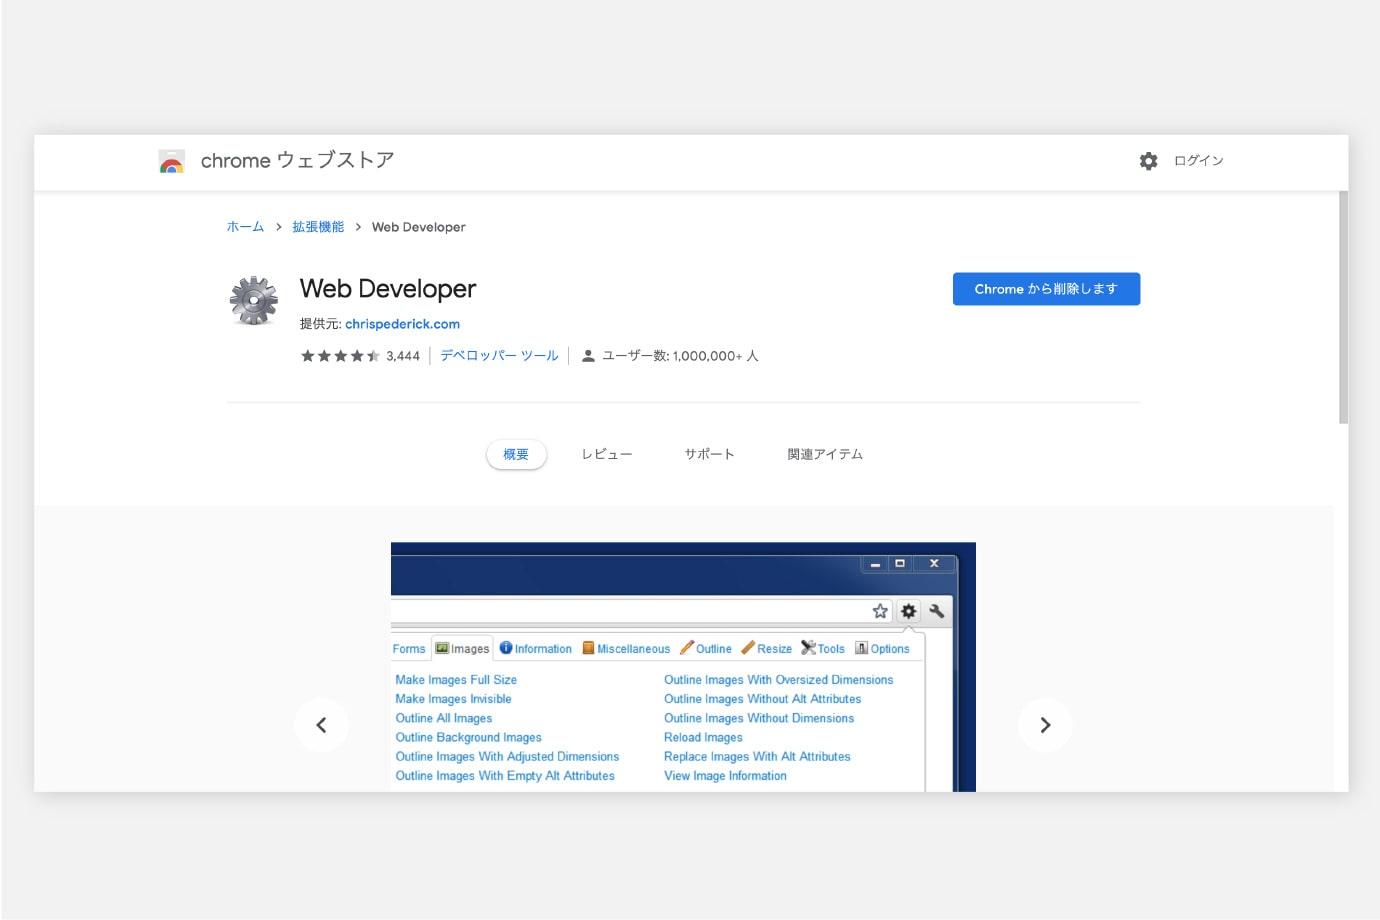 Web Developer Chromeダウンロード画面